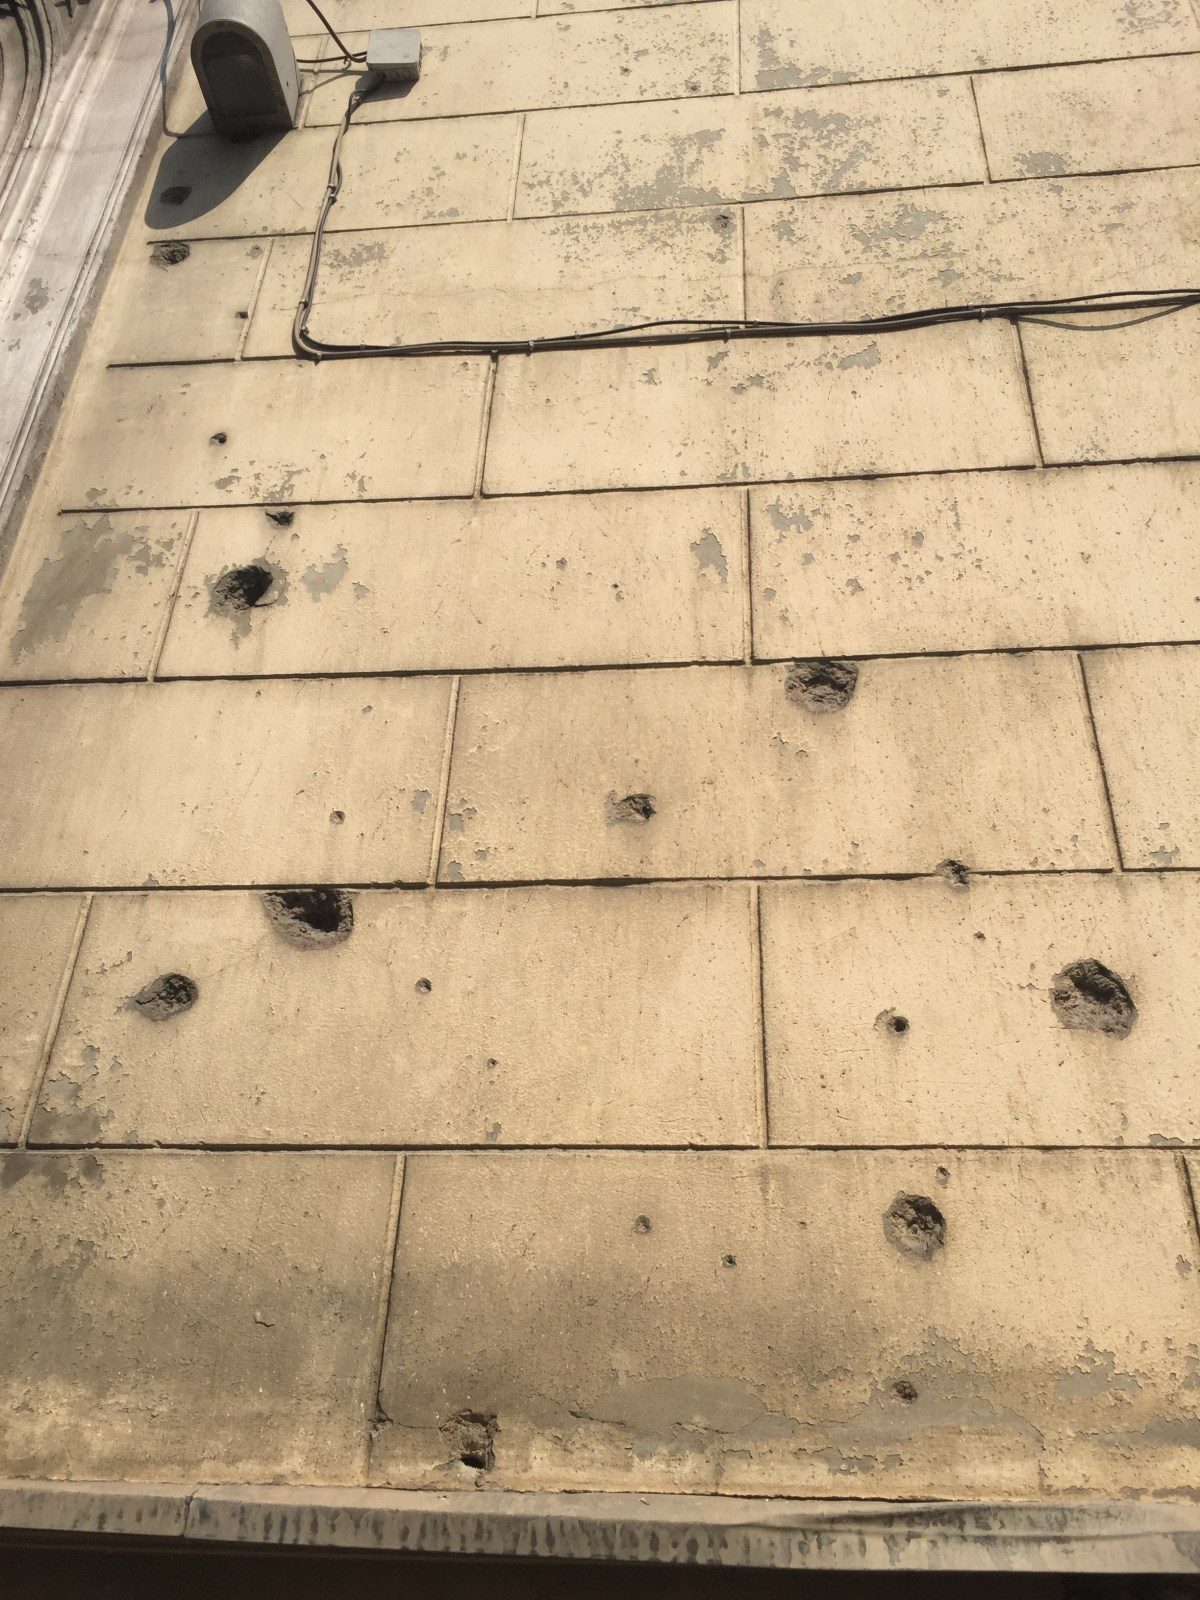 sarajevo bullet holes